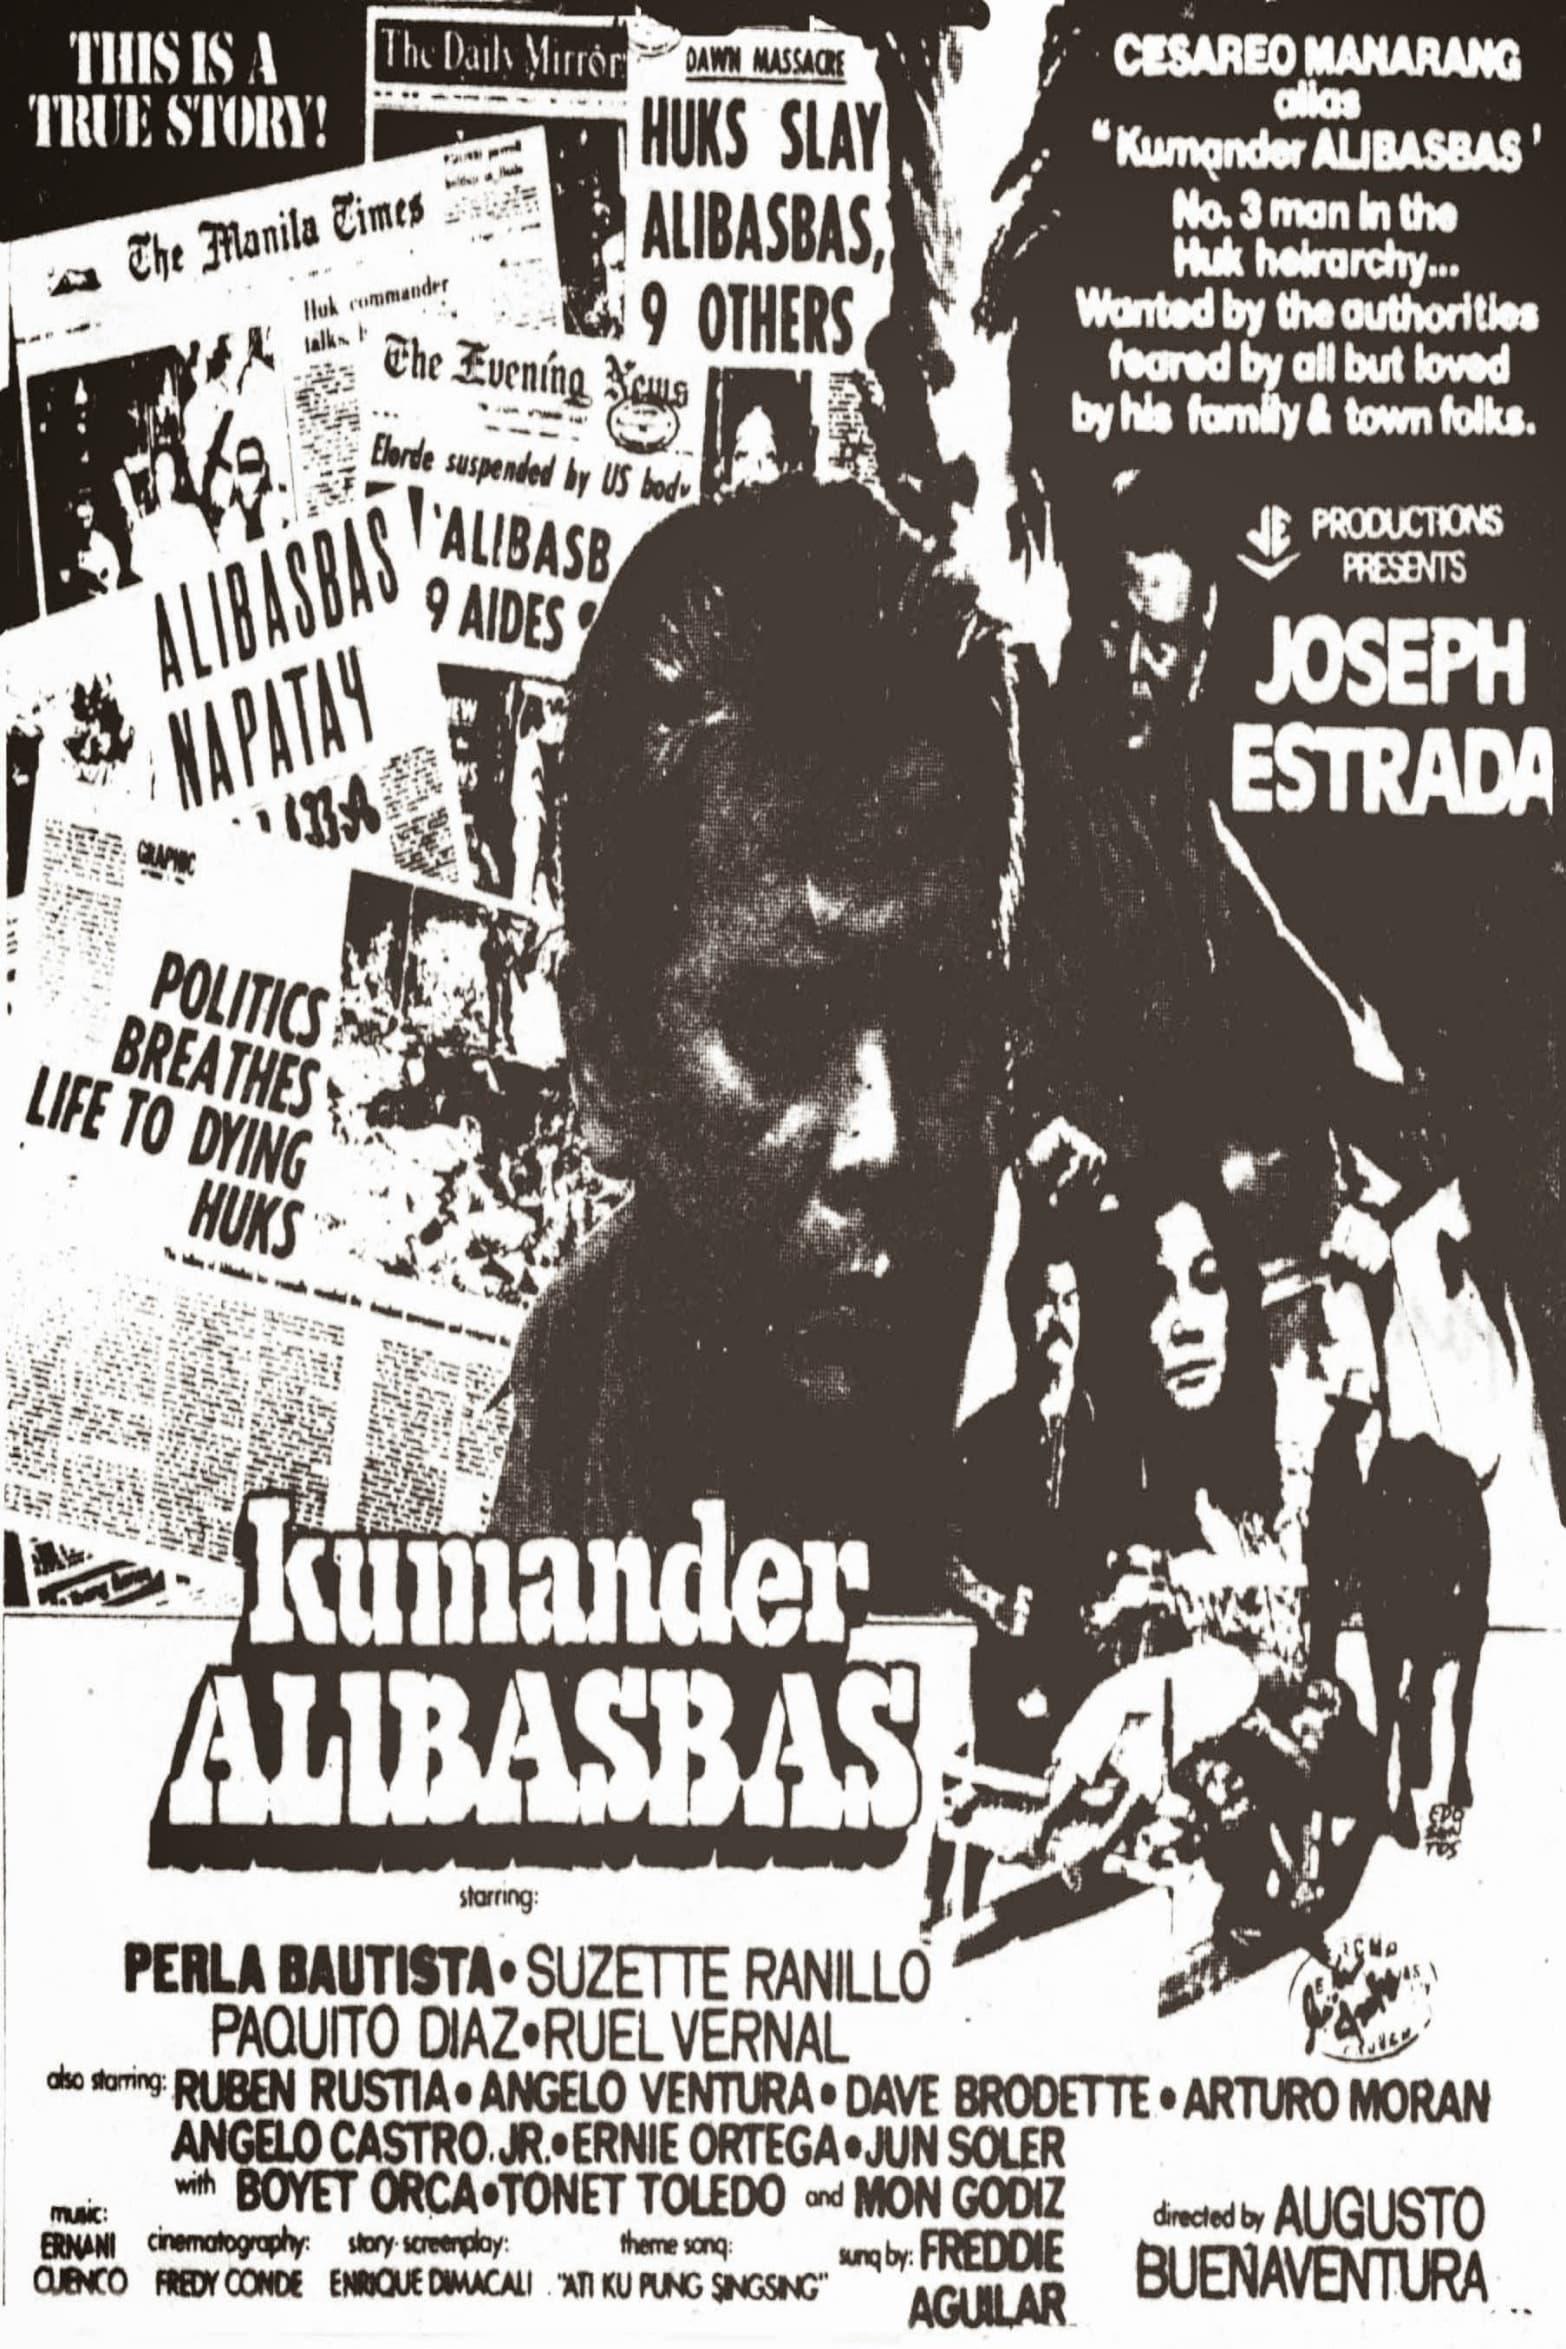 Kumander Alibasbas